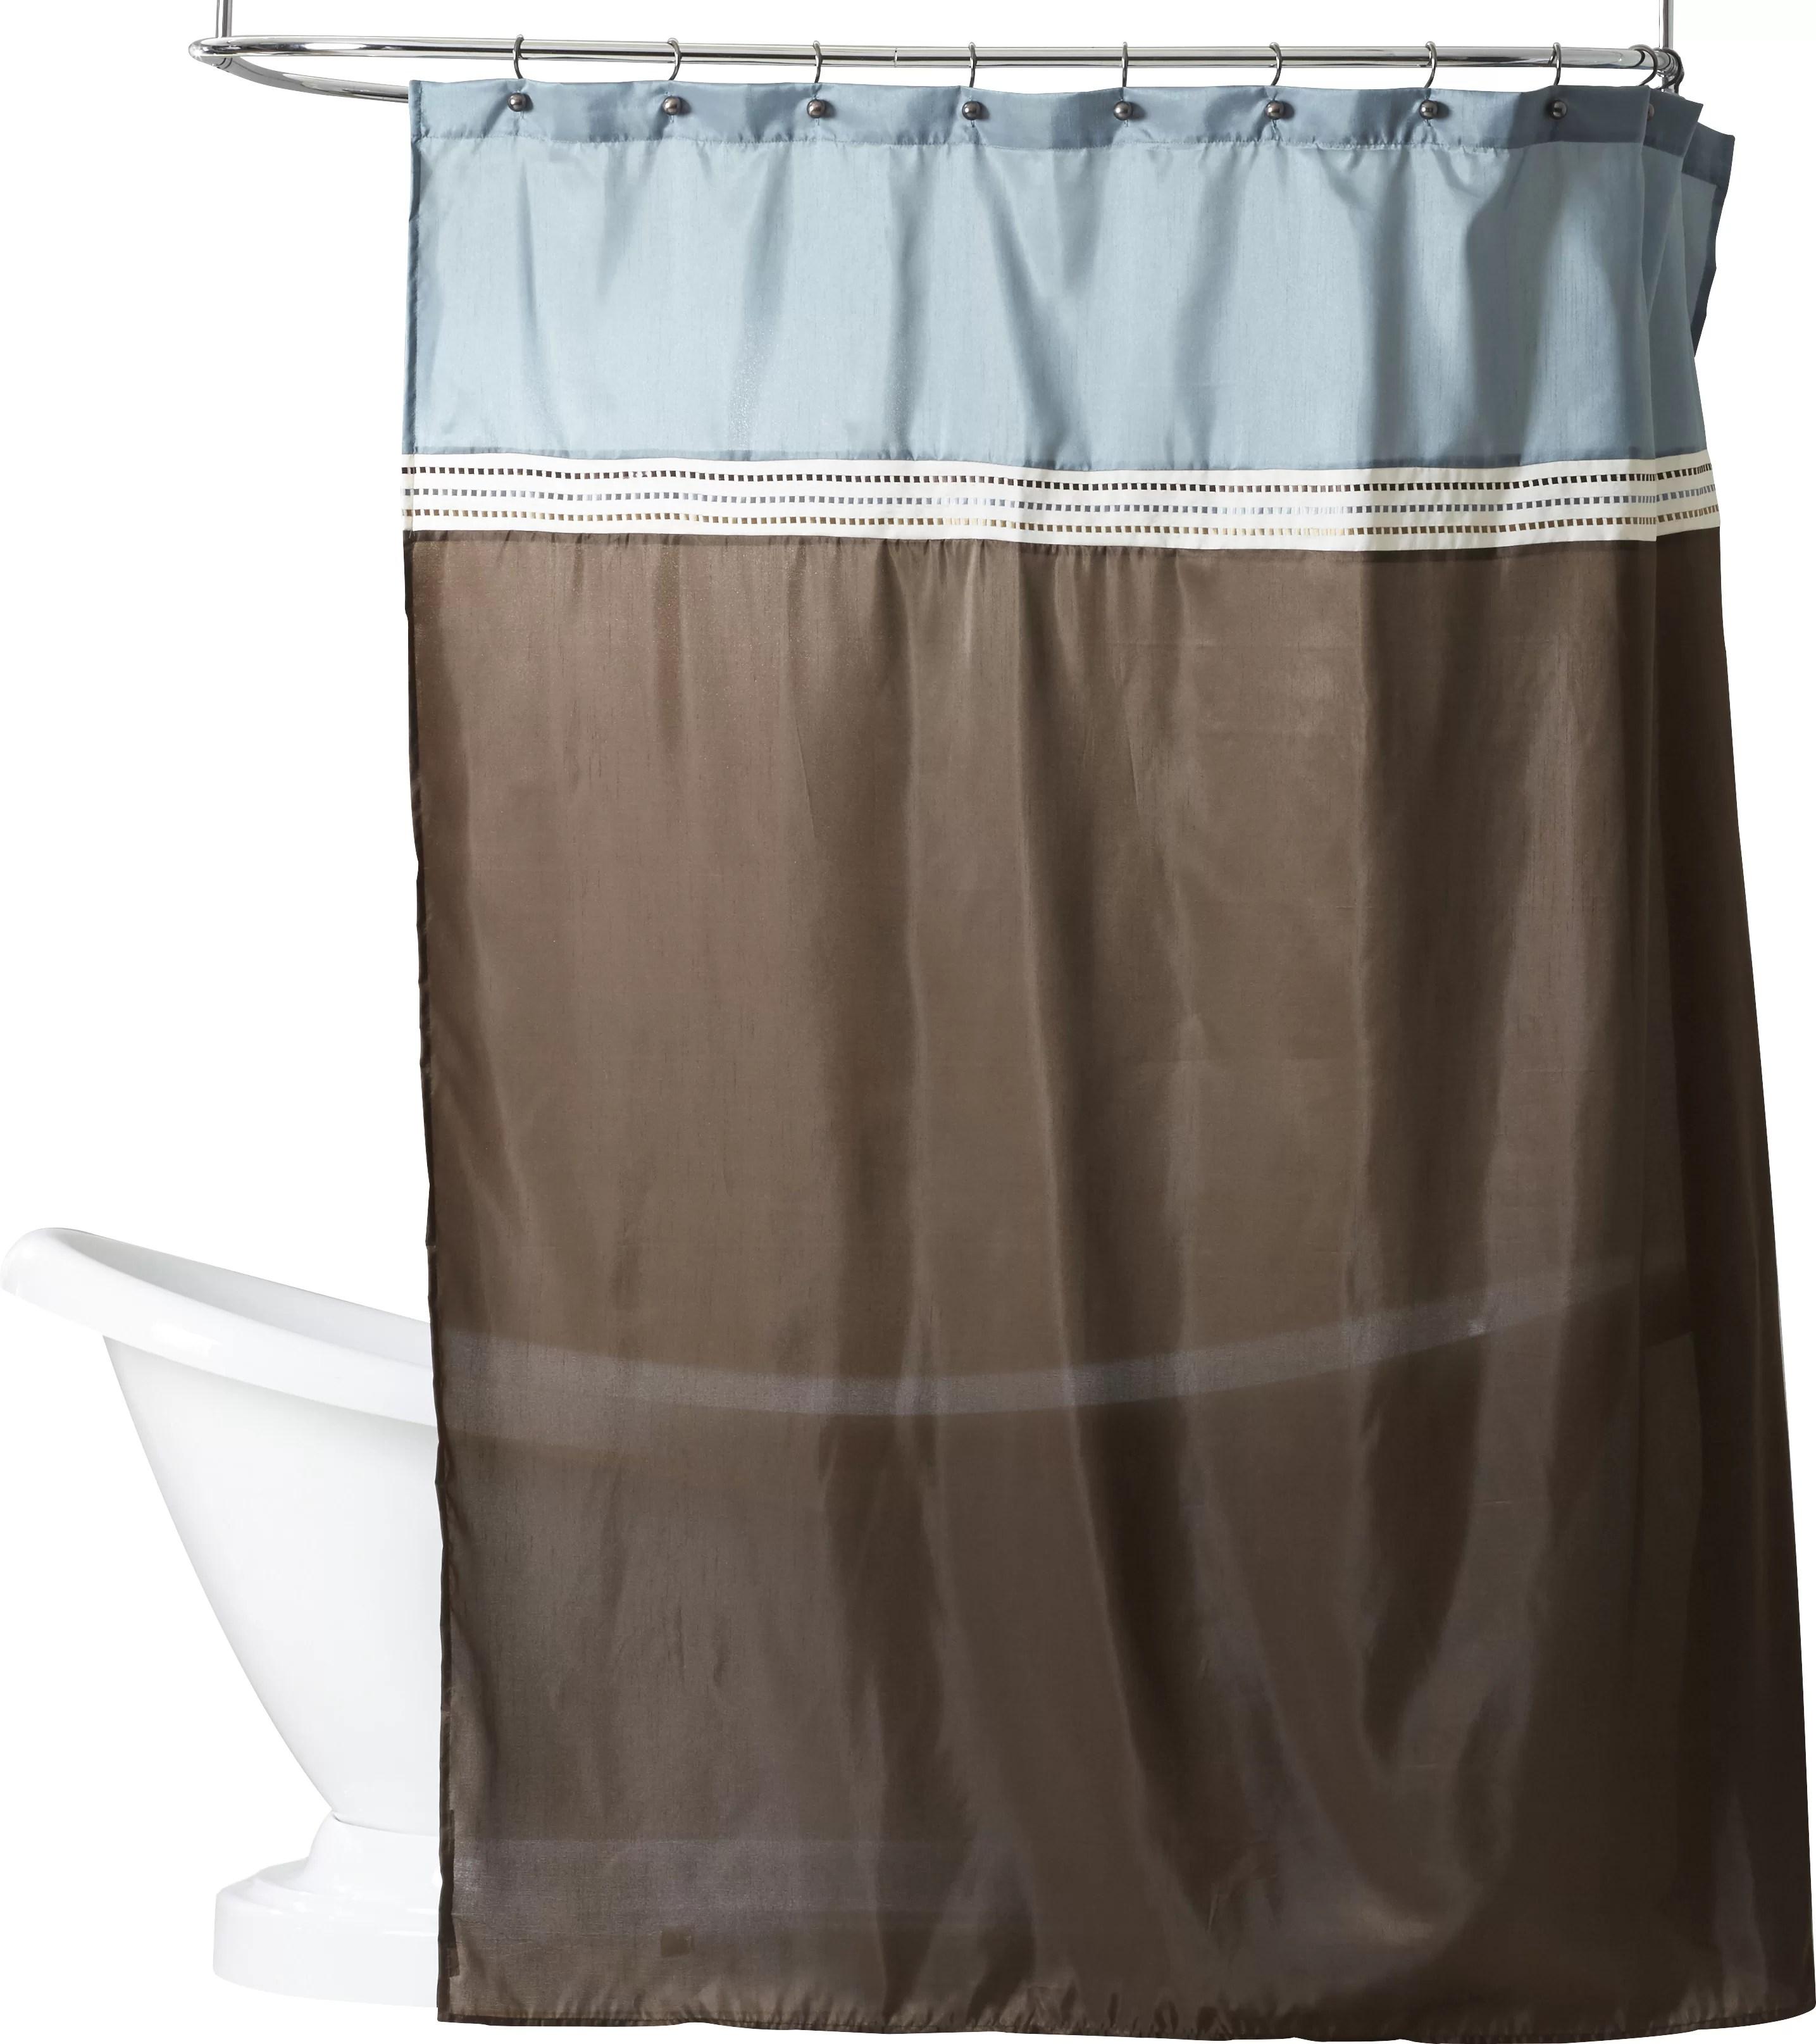 bathroom shower curtain with 12hooks